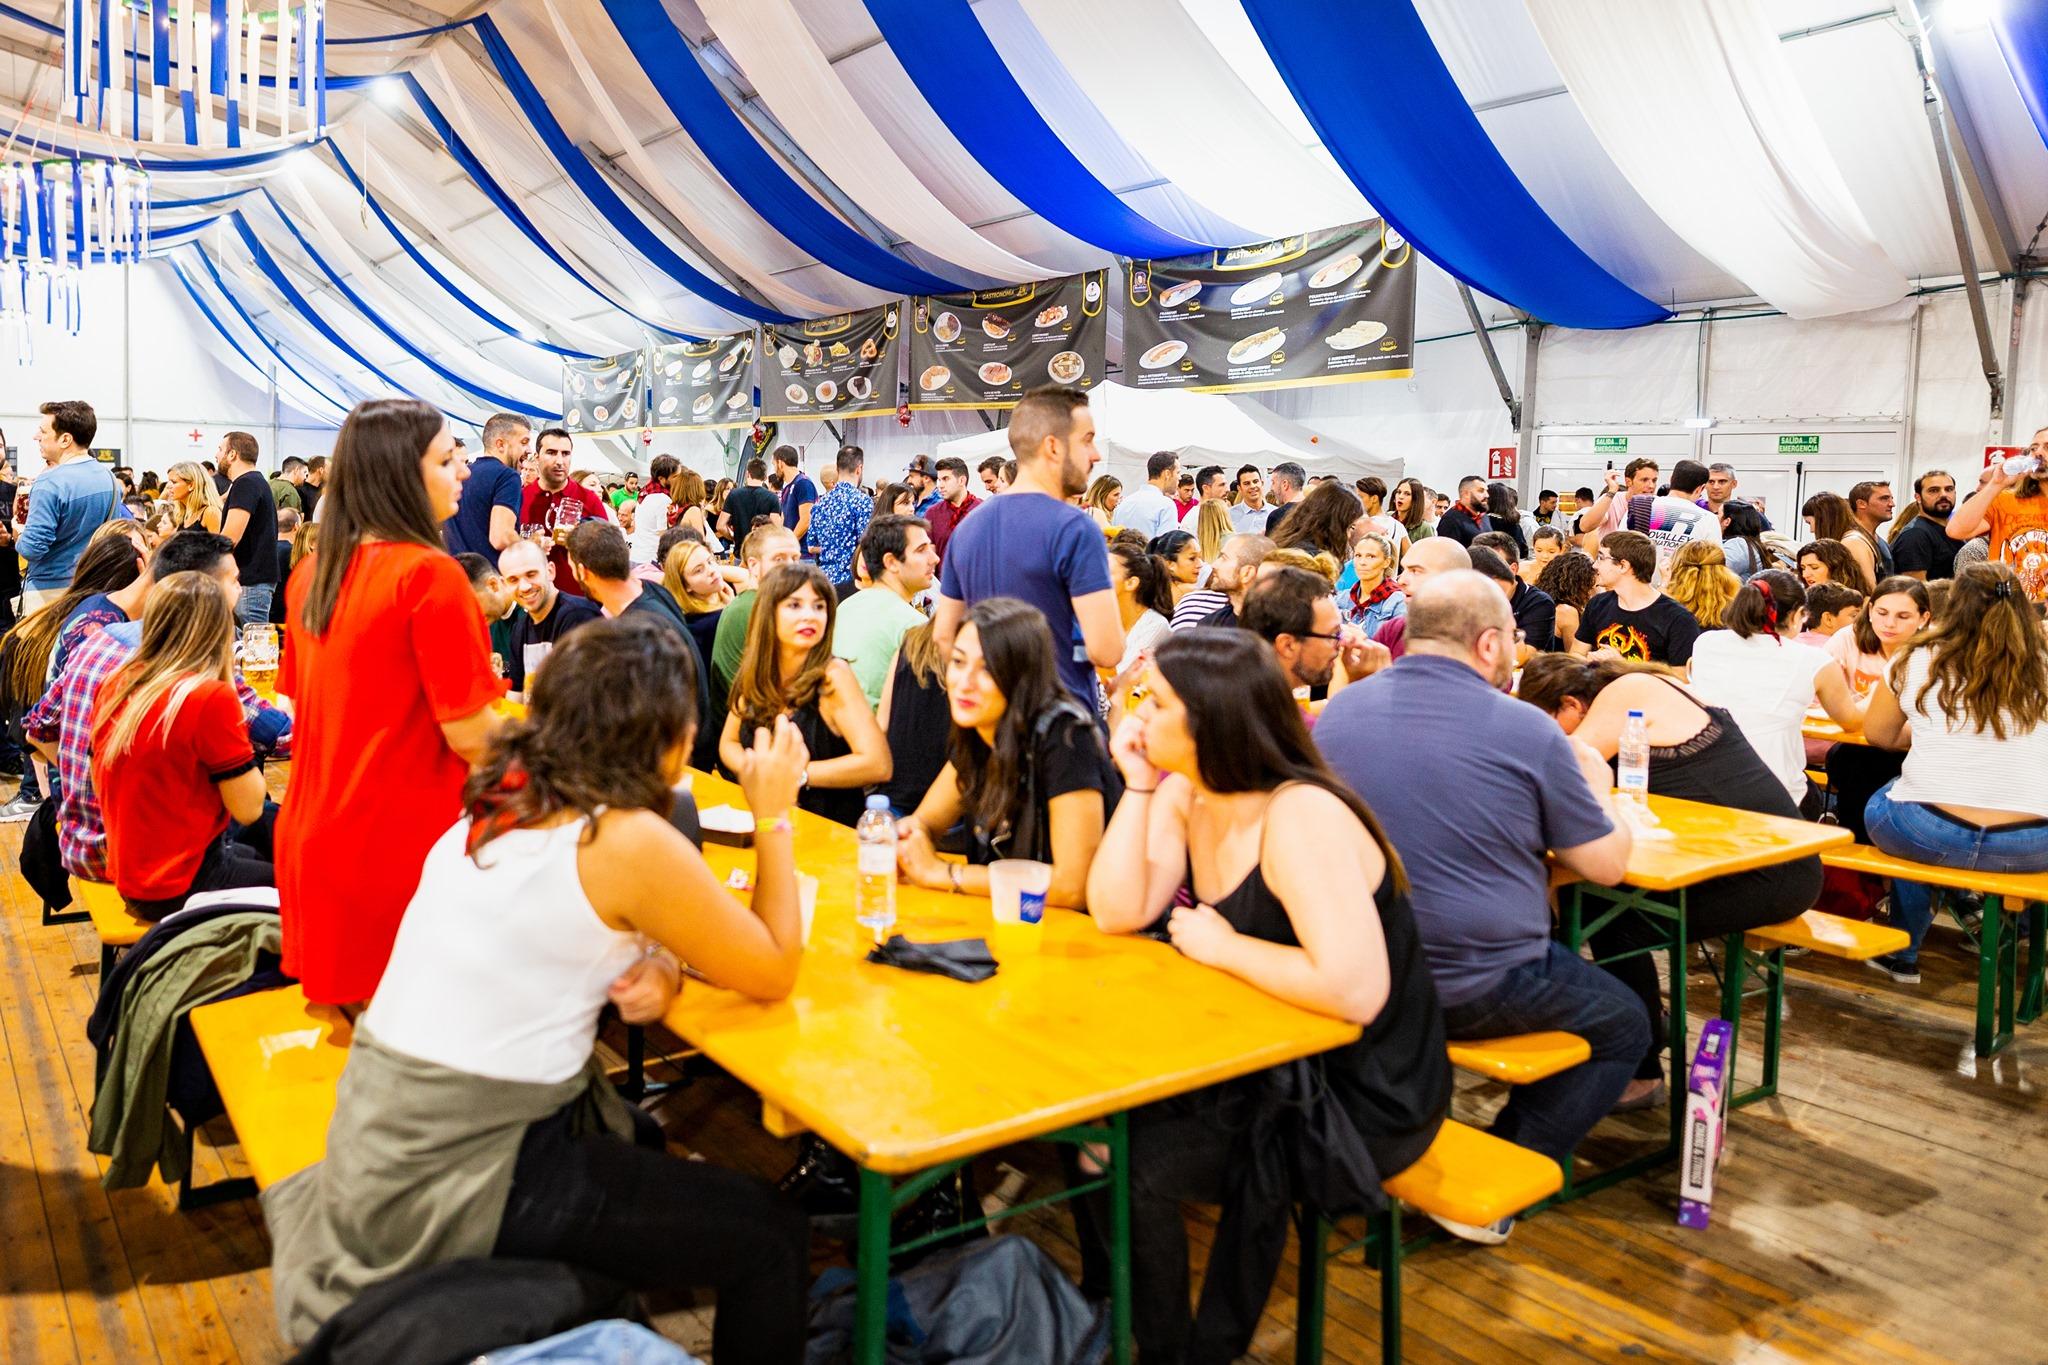 interior carpa valdespartera oktoberfest fiesta de la cerveza zaragoza